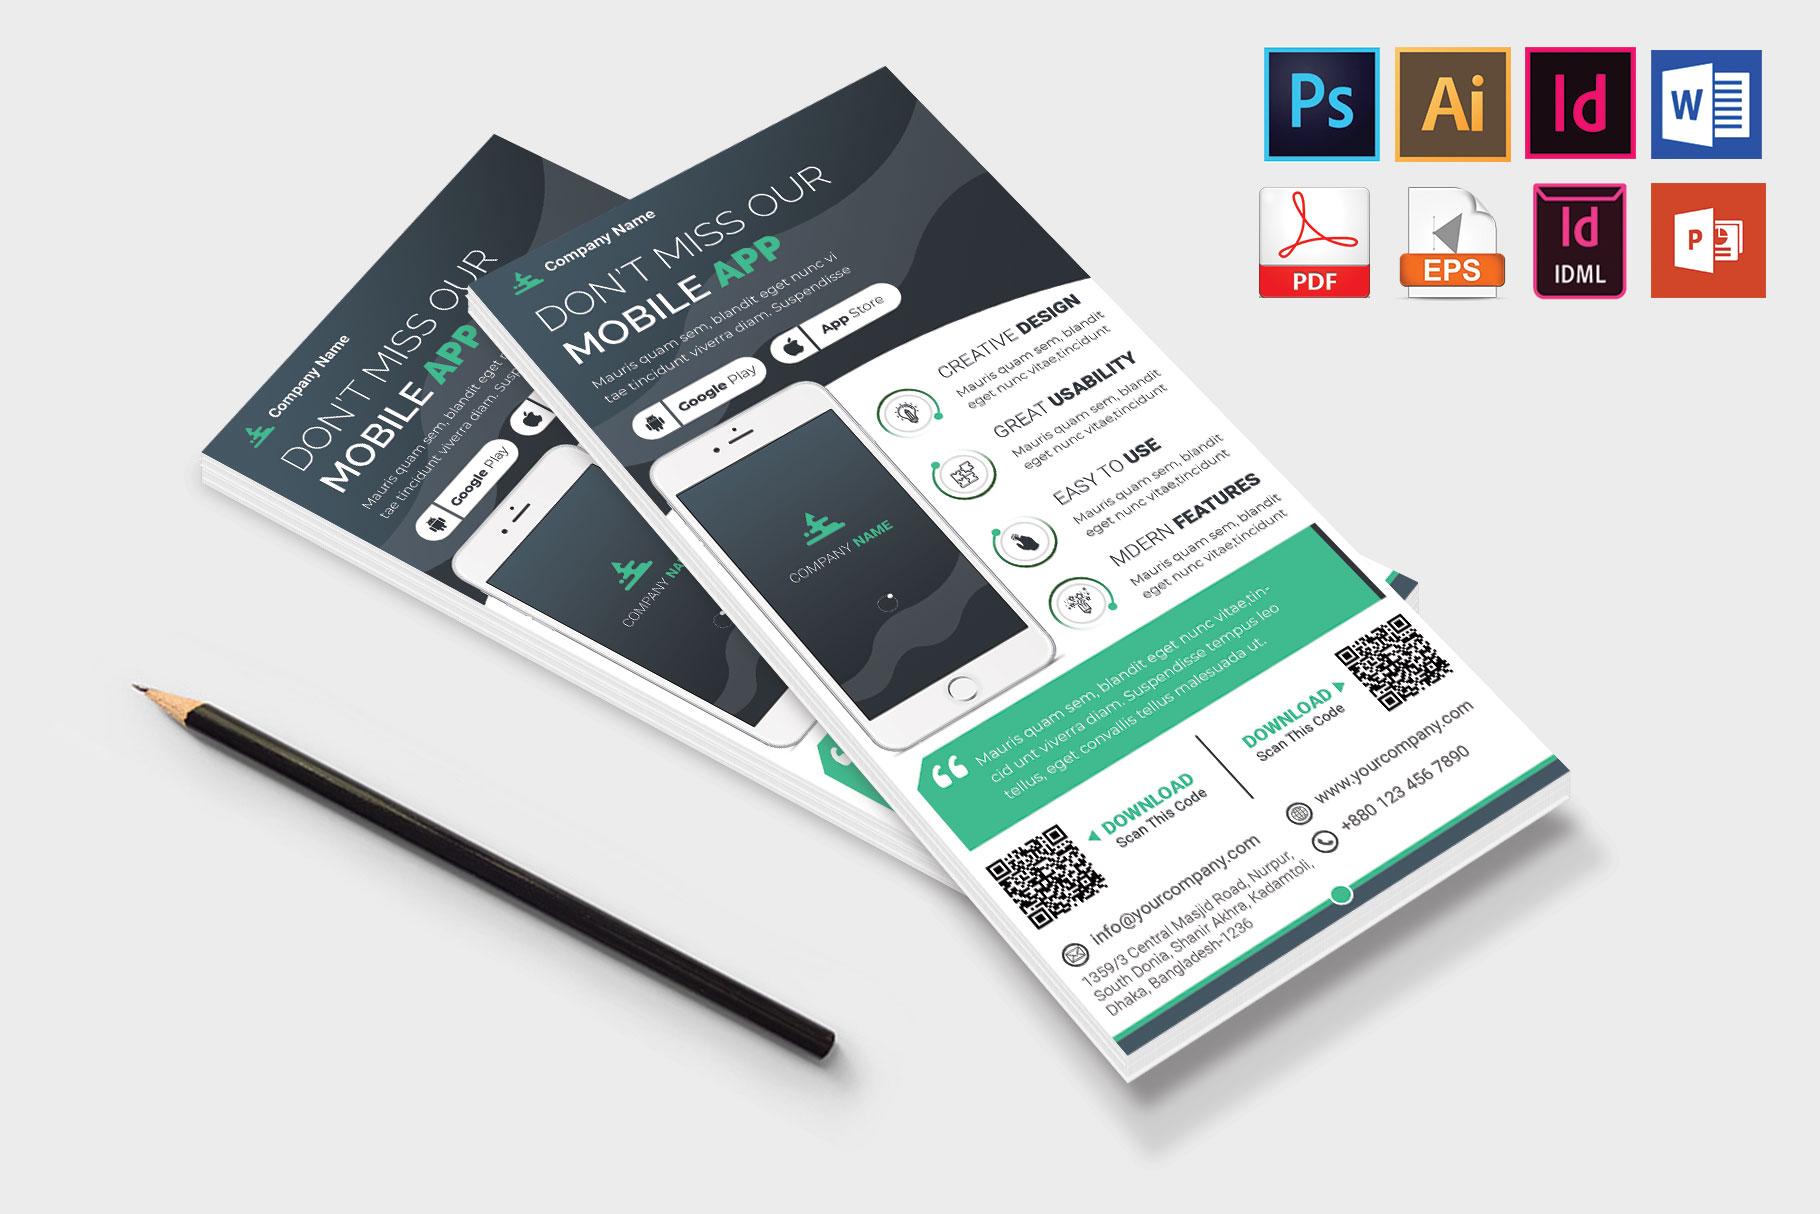 Mobile App Promotion DL Flyer Vol-02 example image 4